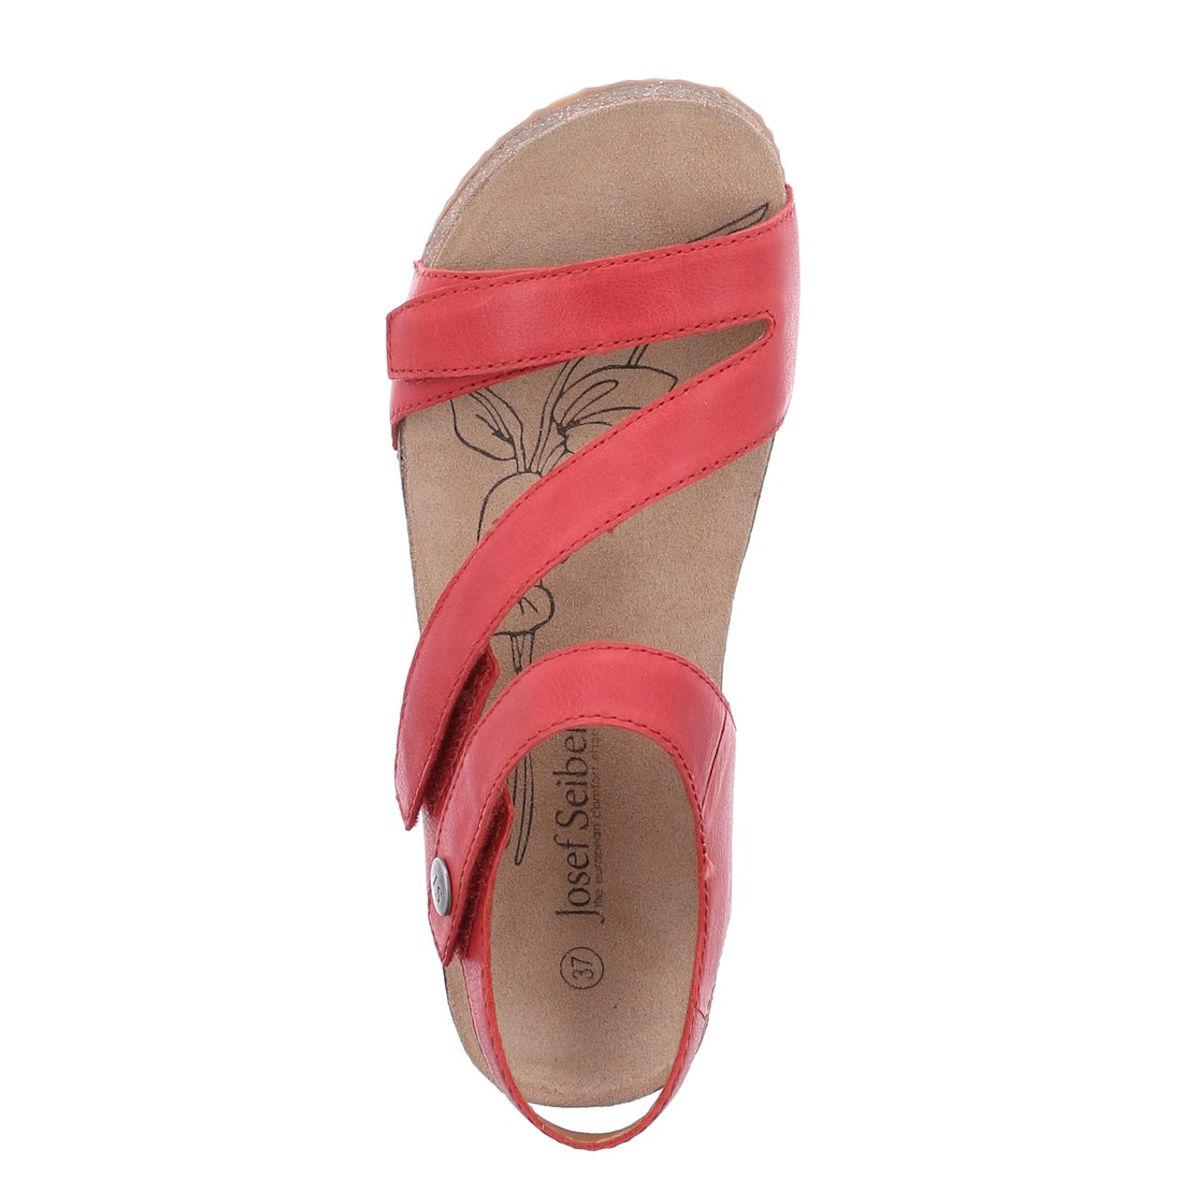 Josef Seibel Tonga 25 - Womens Red Sandal